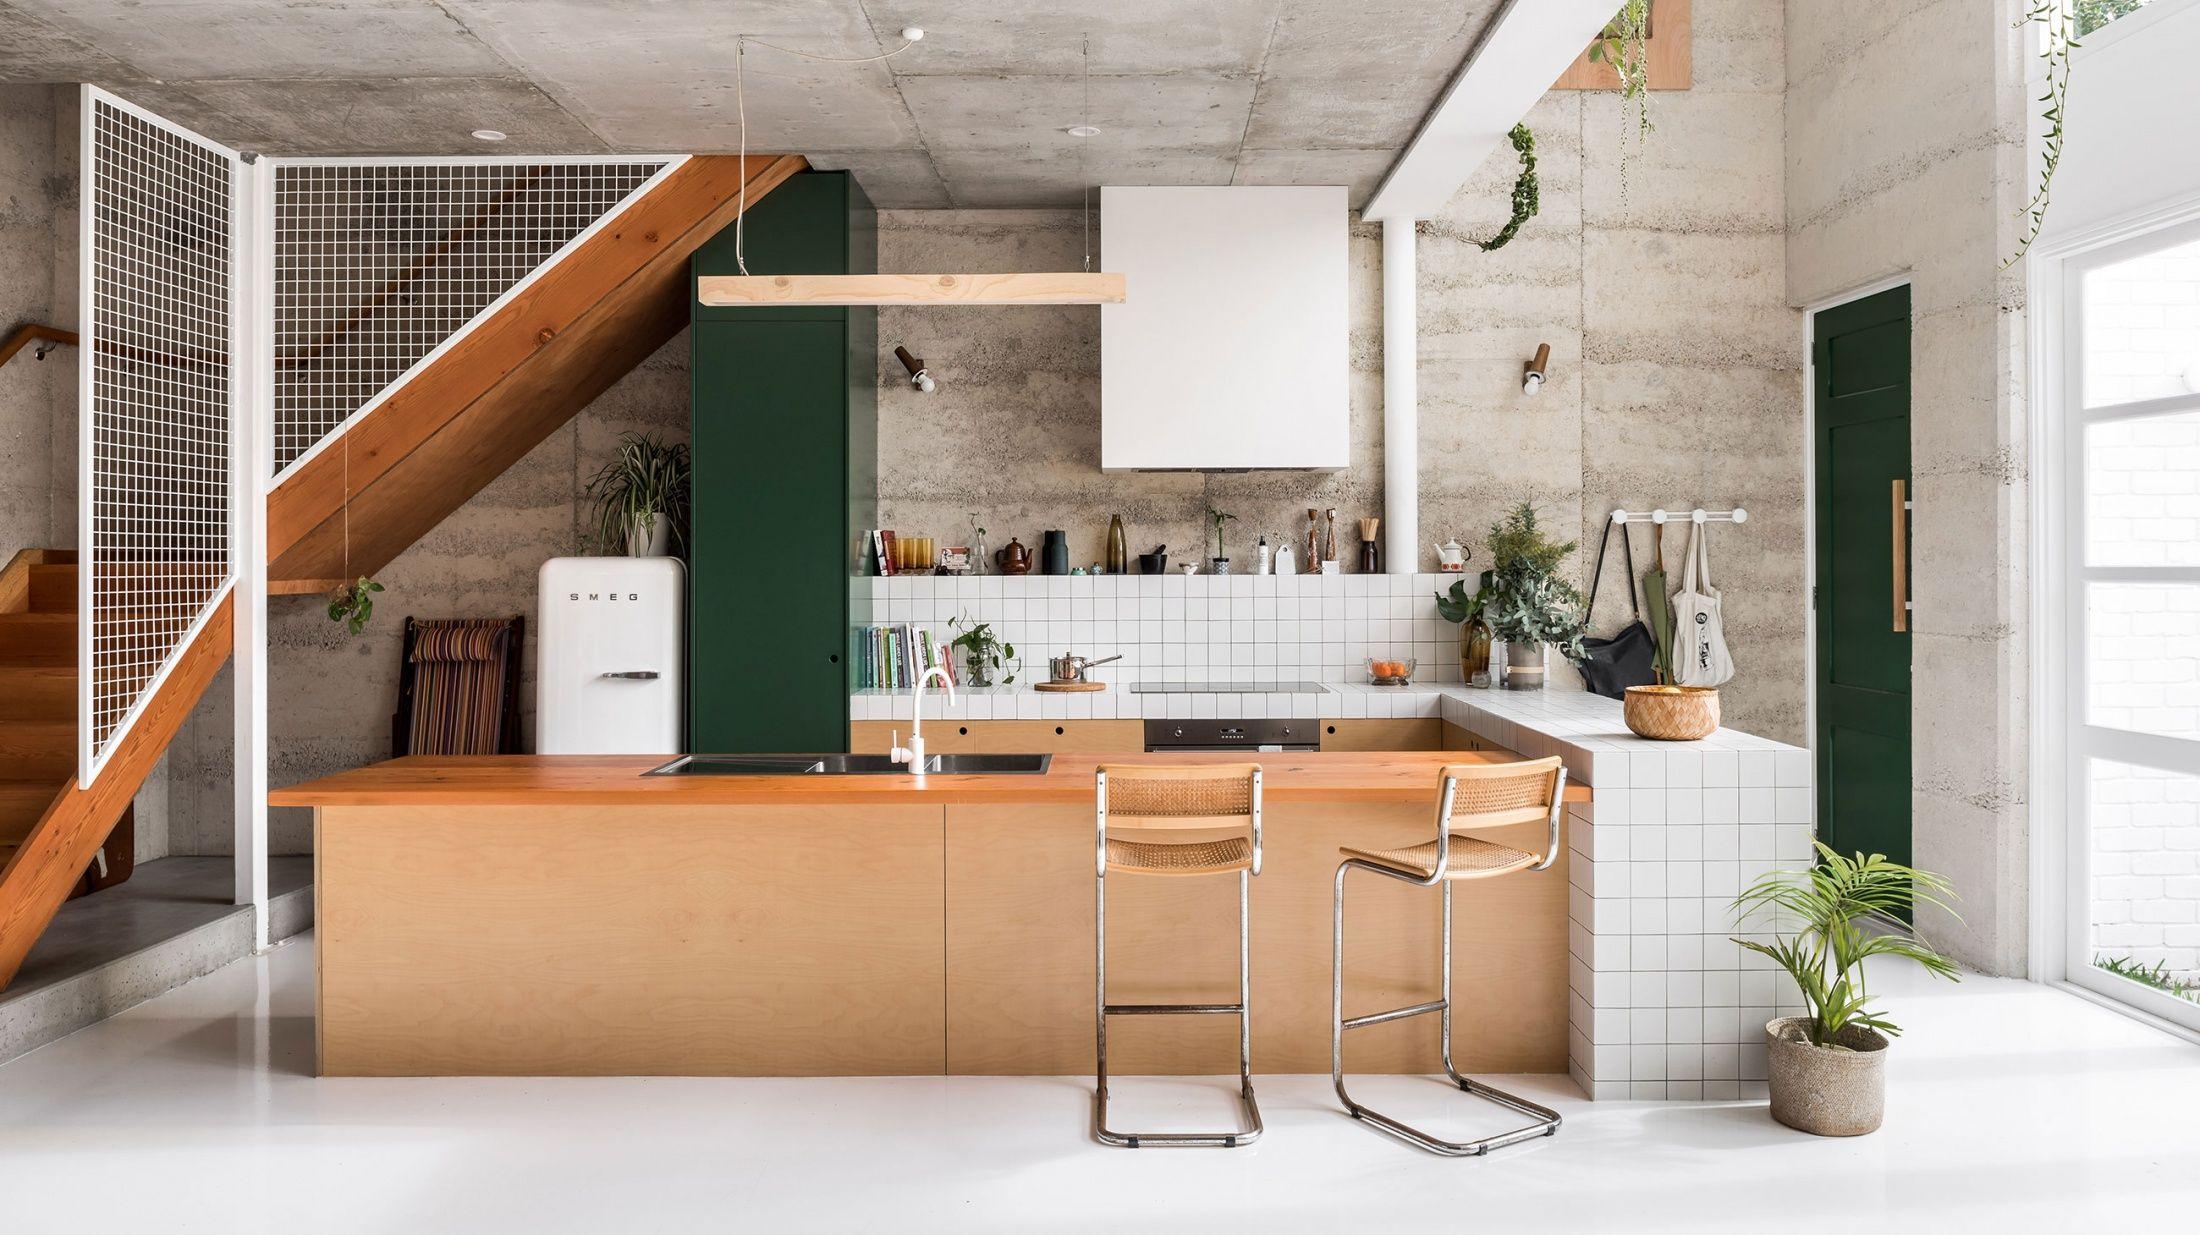 Kitchen eco home wa via tdf h m e pinterest door